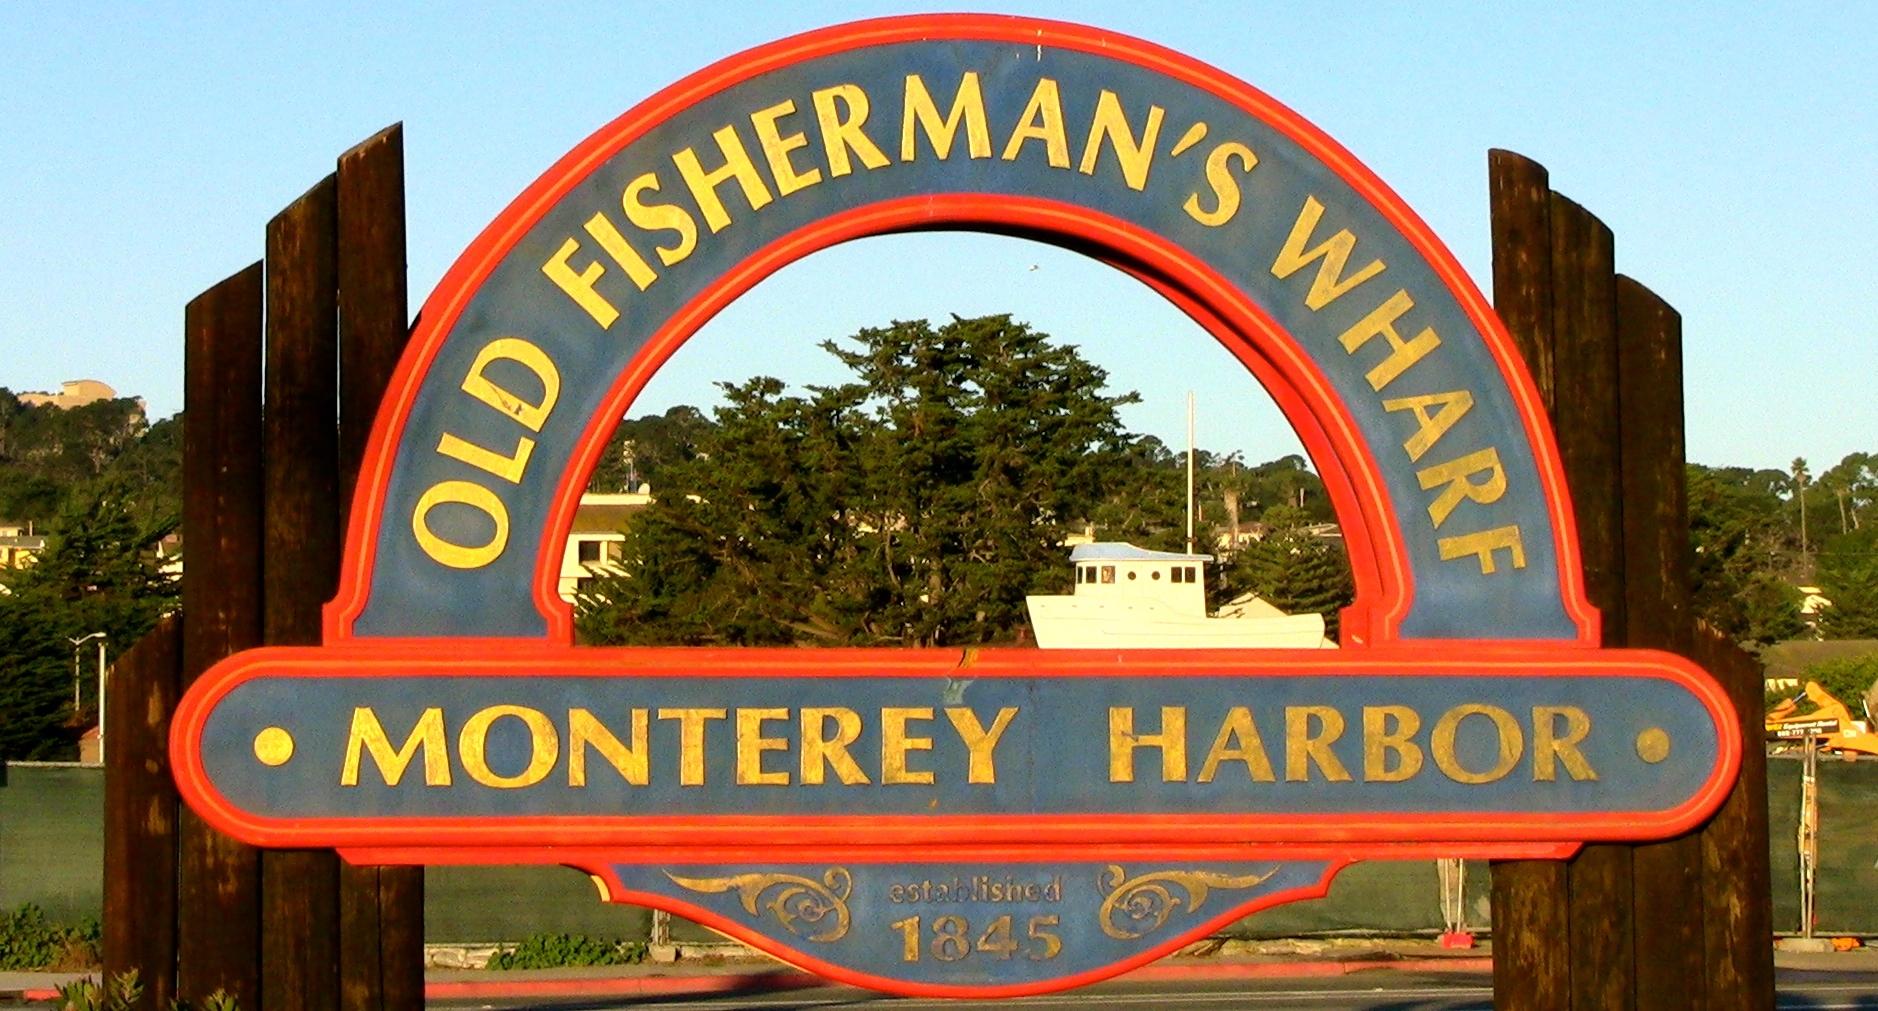 Old_Fisherman's_Wharf_Sign,_Monterey,_CA,_4_December,_2011